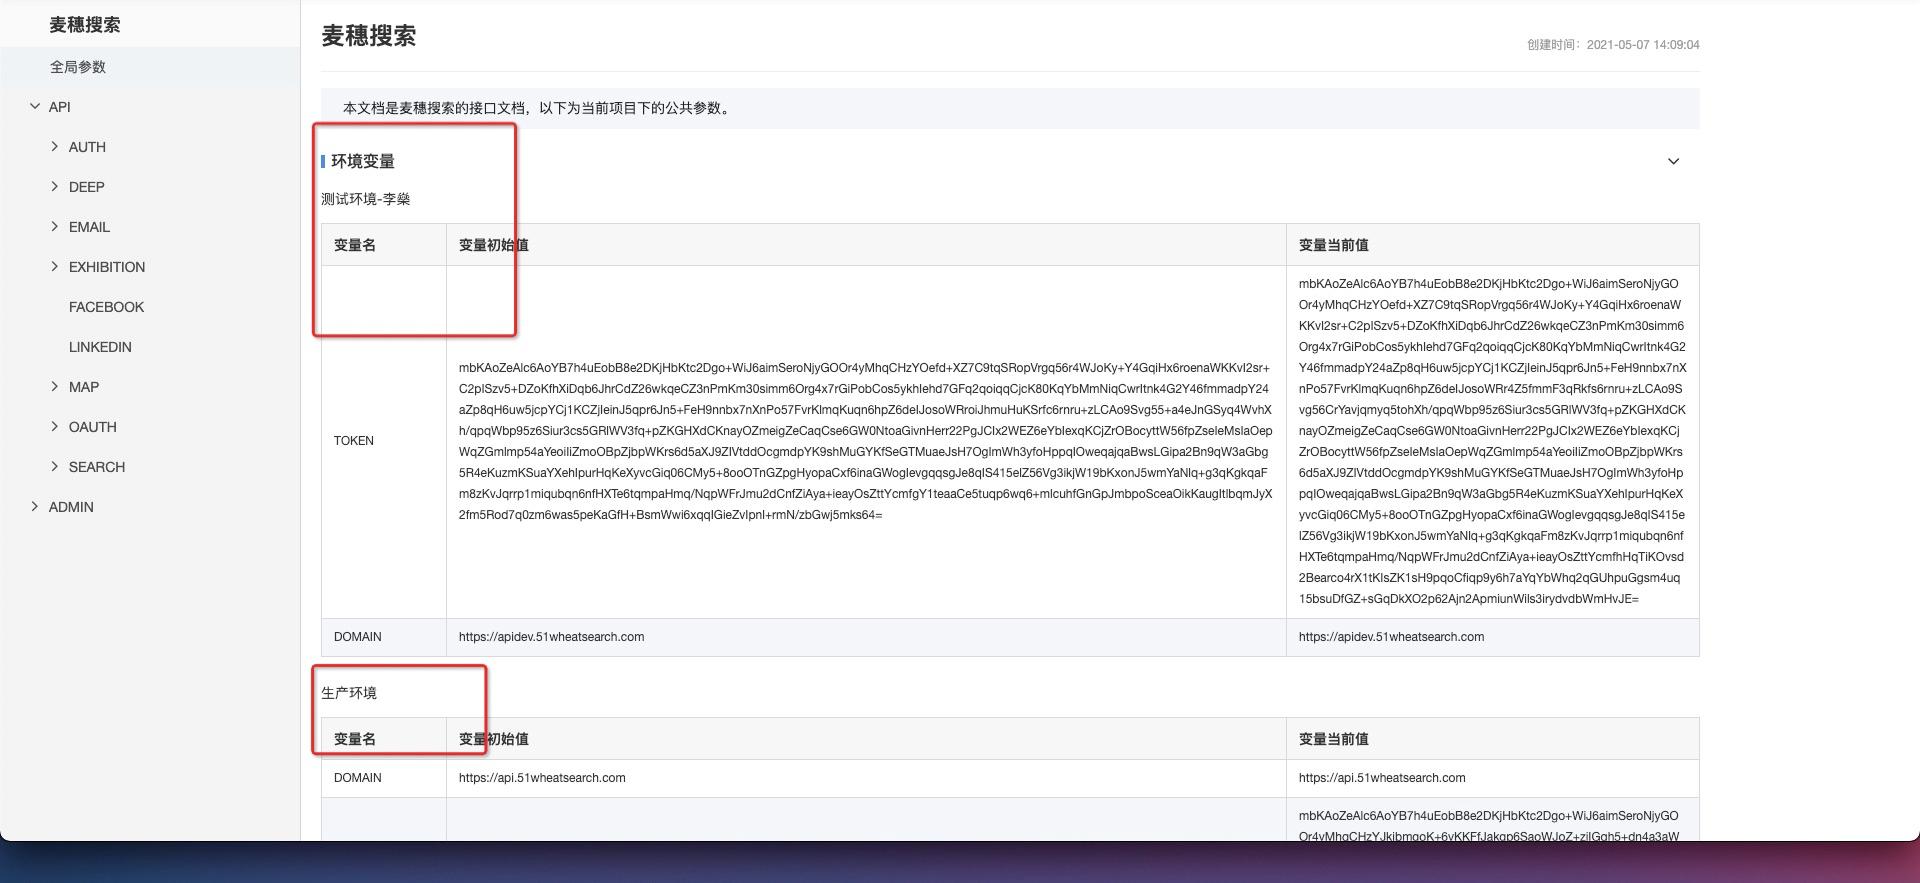 API文档分享,不想把所有环境变量分享出去,希望环境变量这部分可以自定义